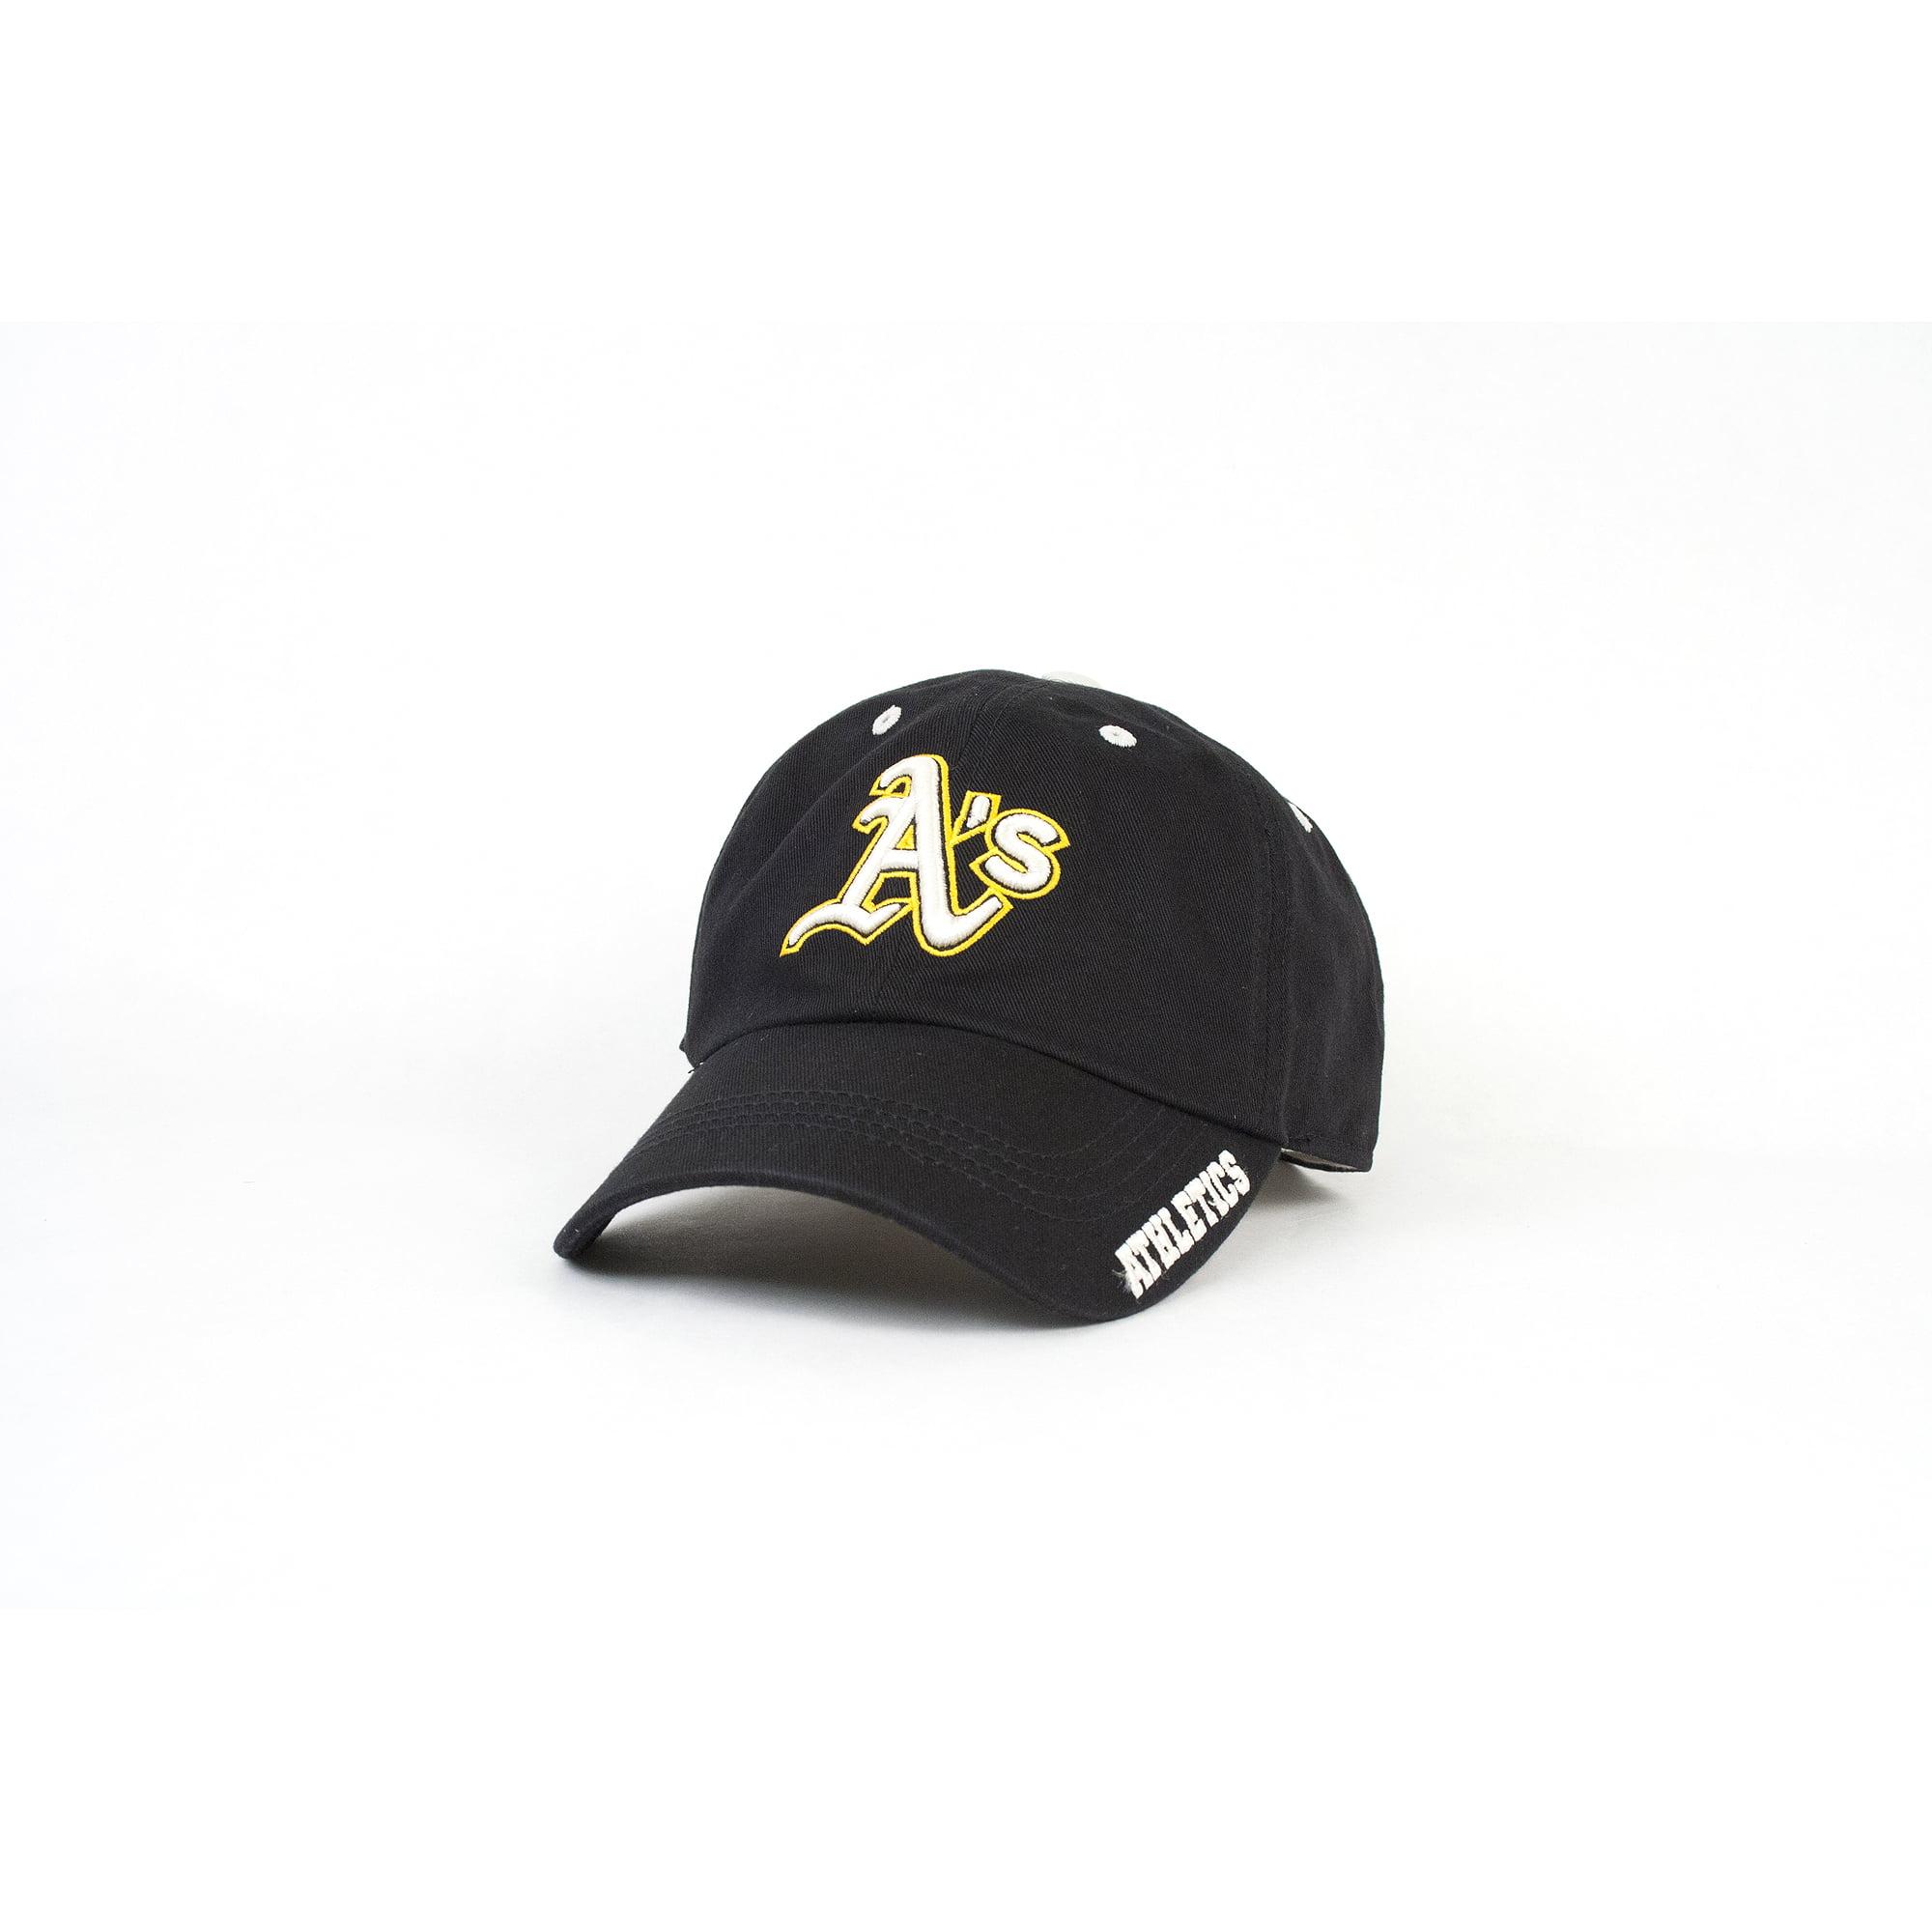 MLB Athletics Cotton Twill Cap